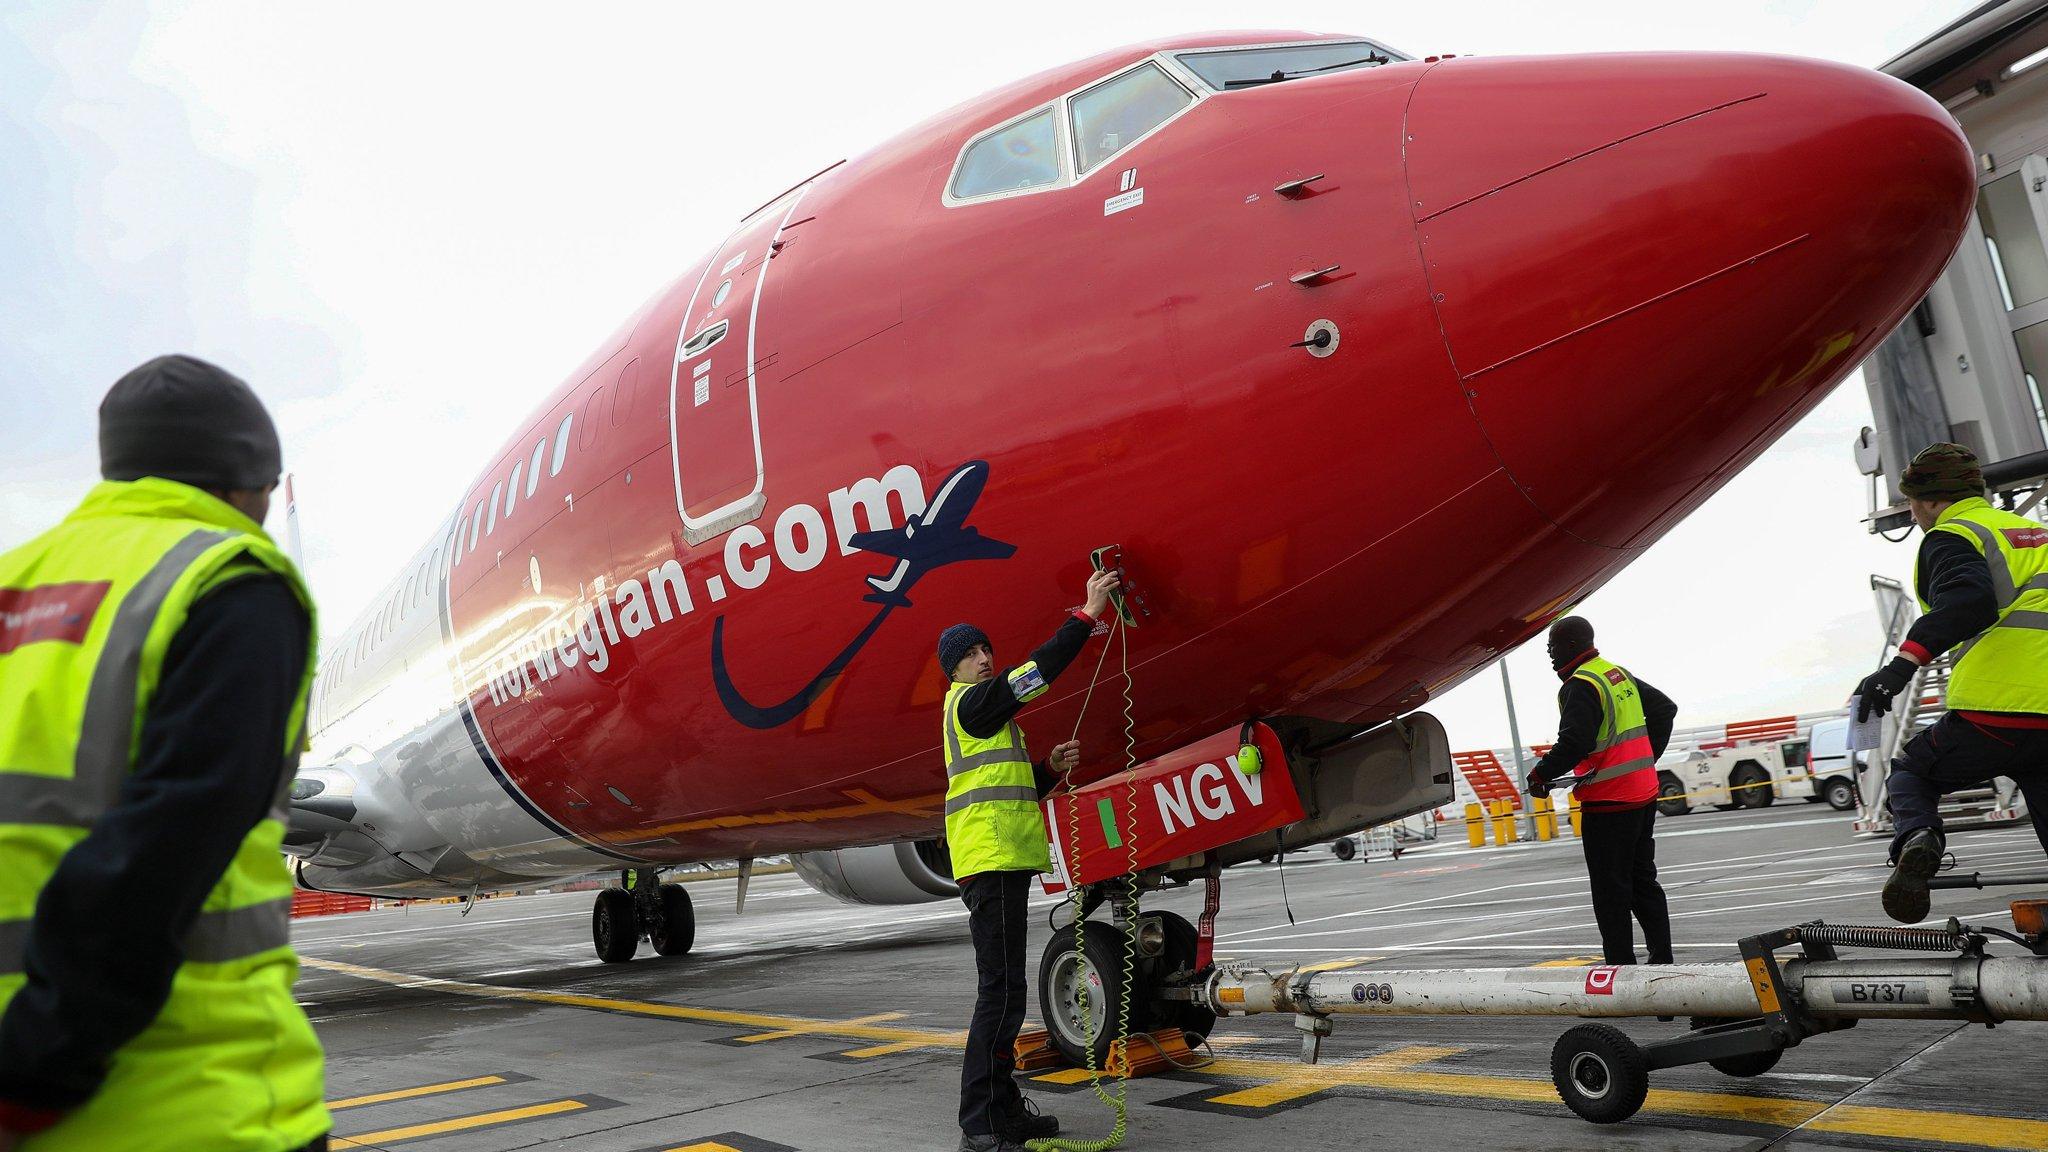 Resultado de imagen para Lufthansa Norwegian Air